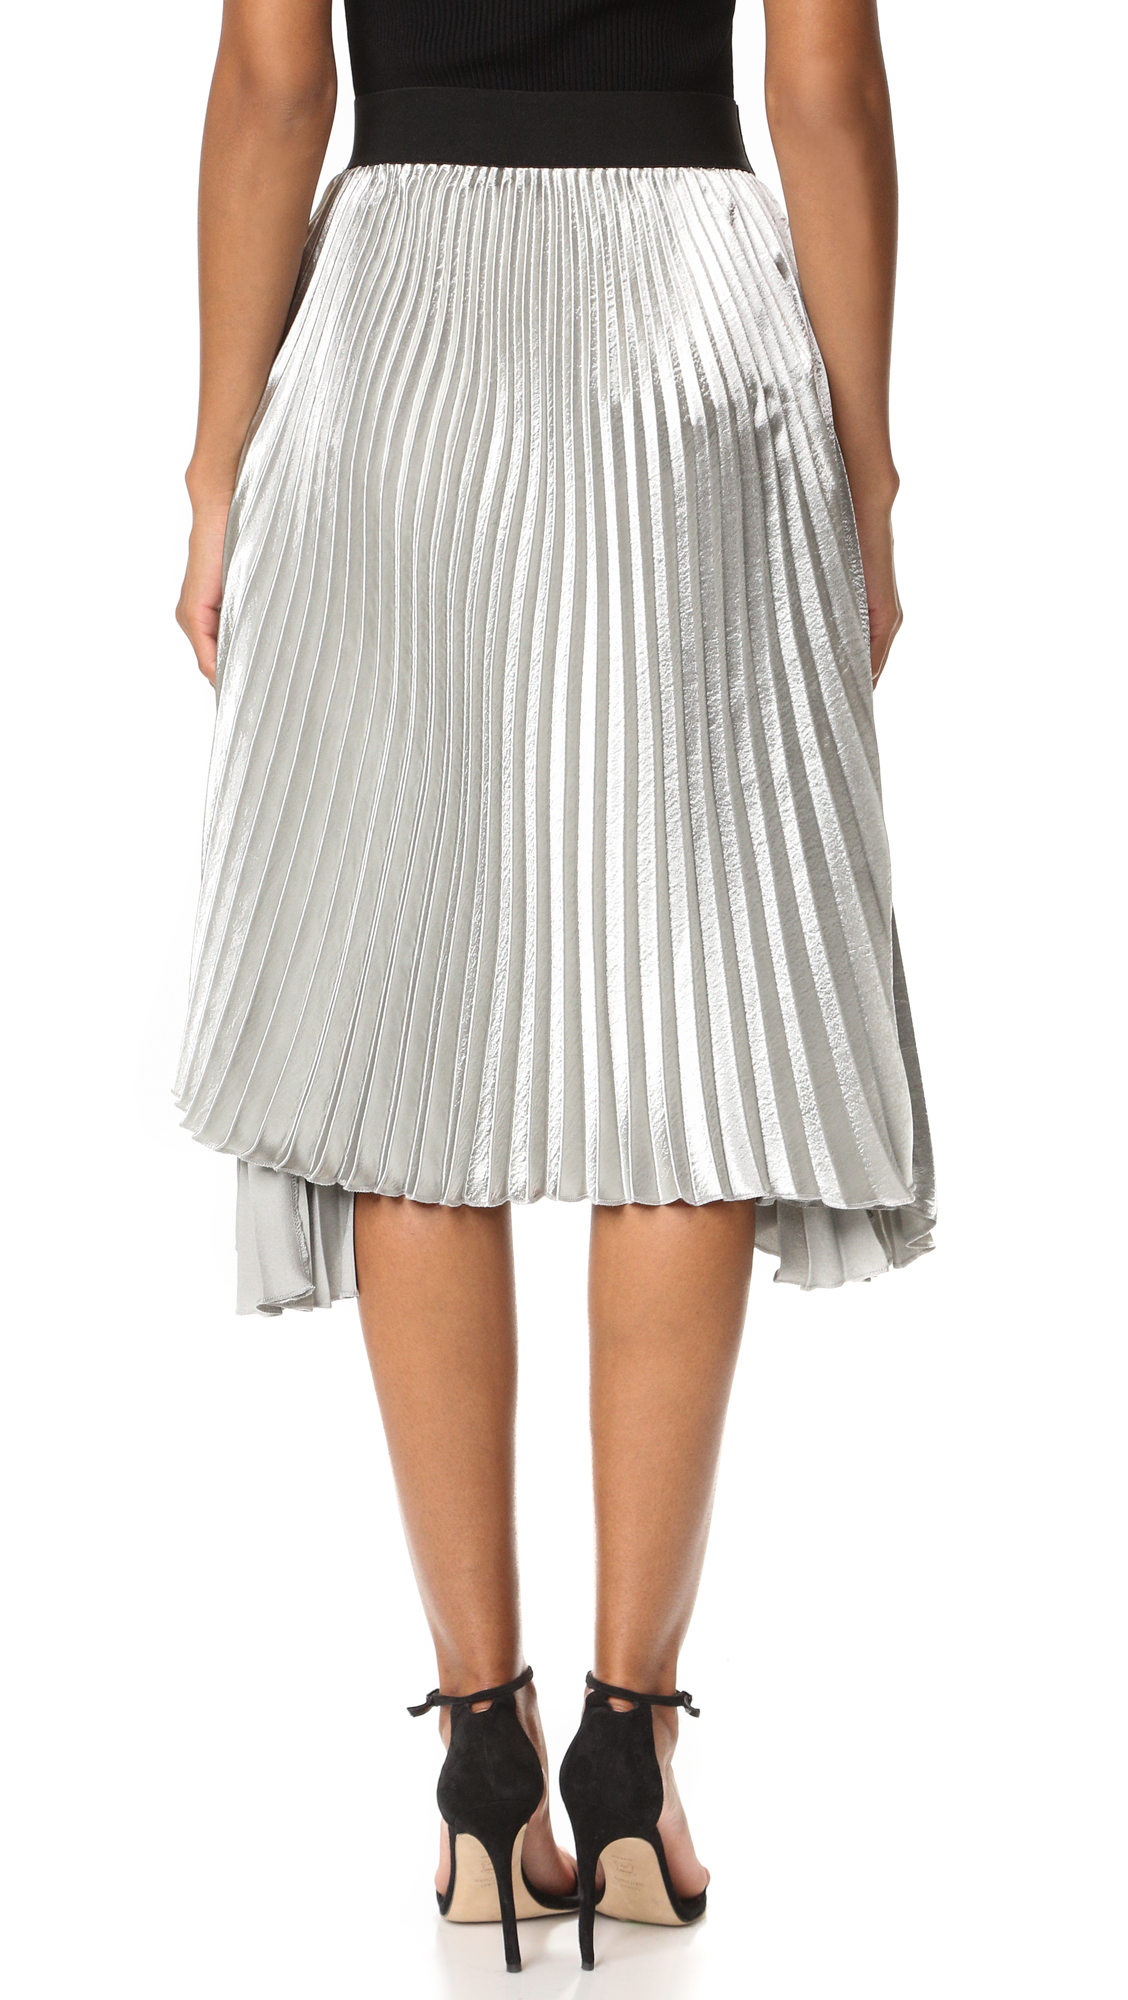 848acdec0 STYLEKEEPERS Retro Juliette Pleated Skirt | SHOPBOP